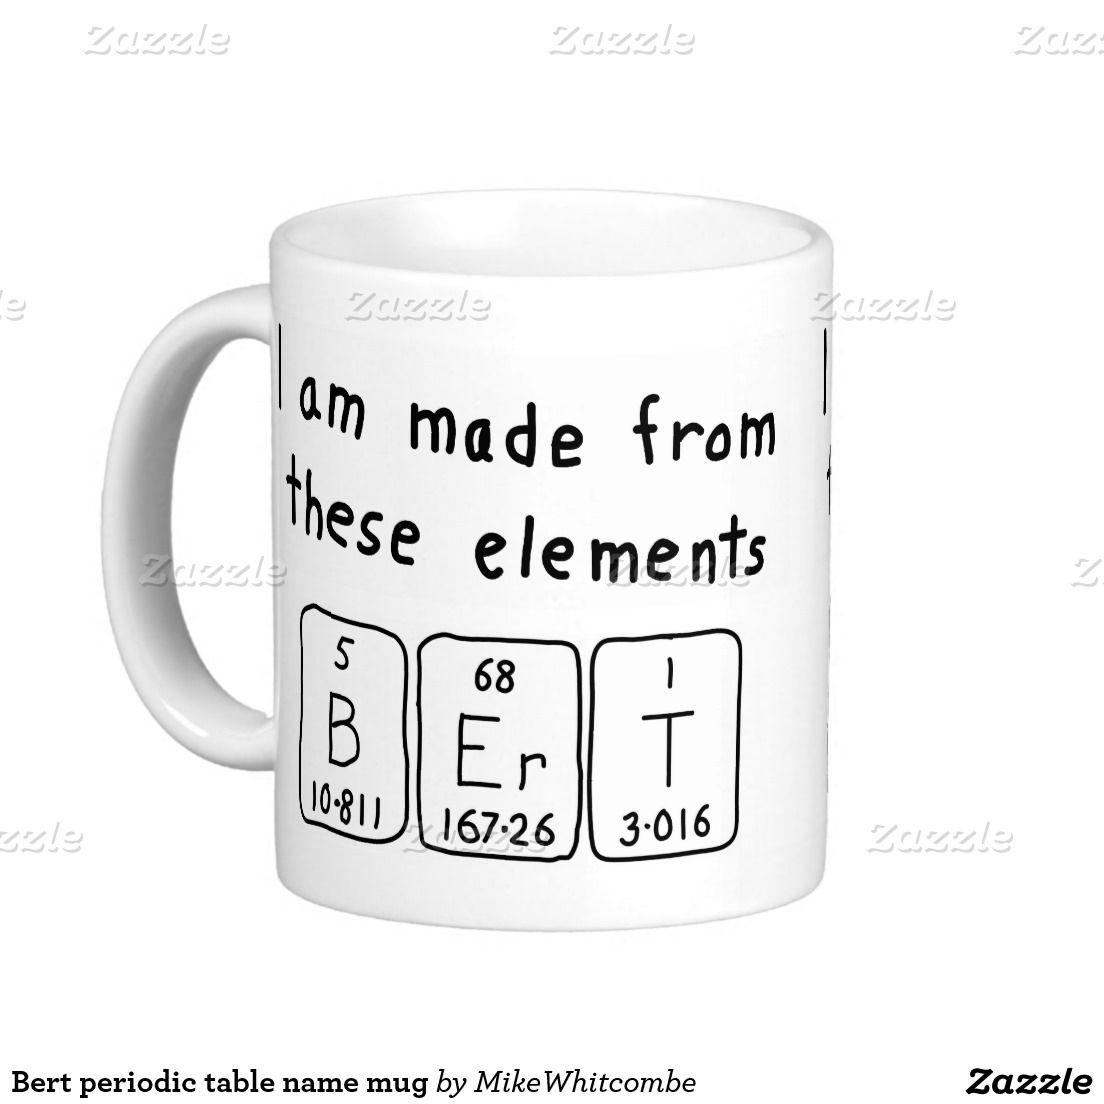 Bert periodic table name mug periodic table tables and table names bert periodic table name mug urtaz Image collections